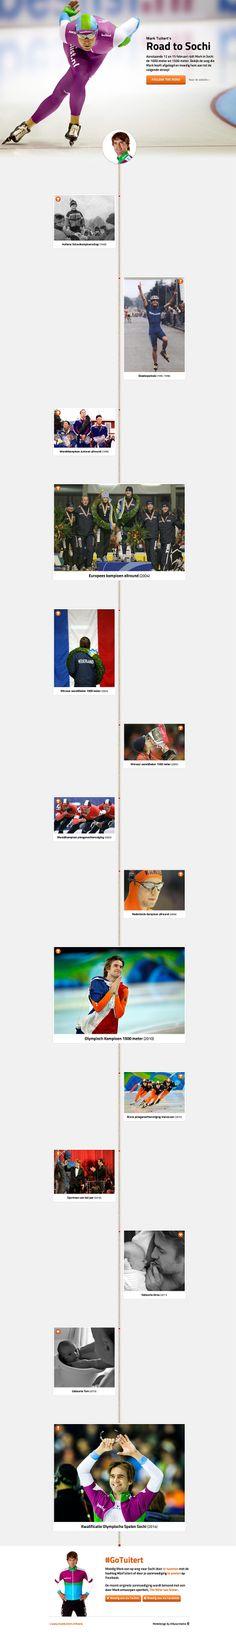 Singel page responsive webdesign for olympic speedskating champion Mark Tuitert